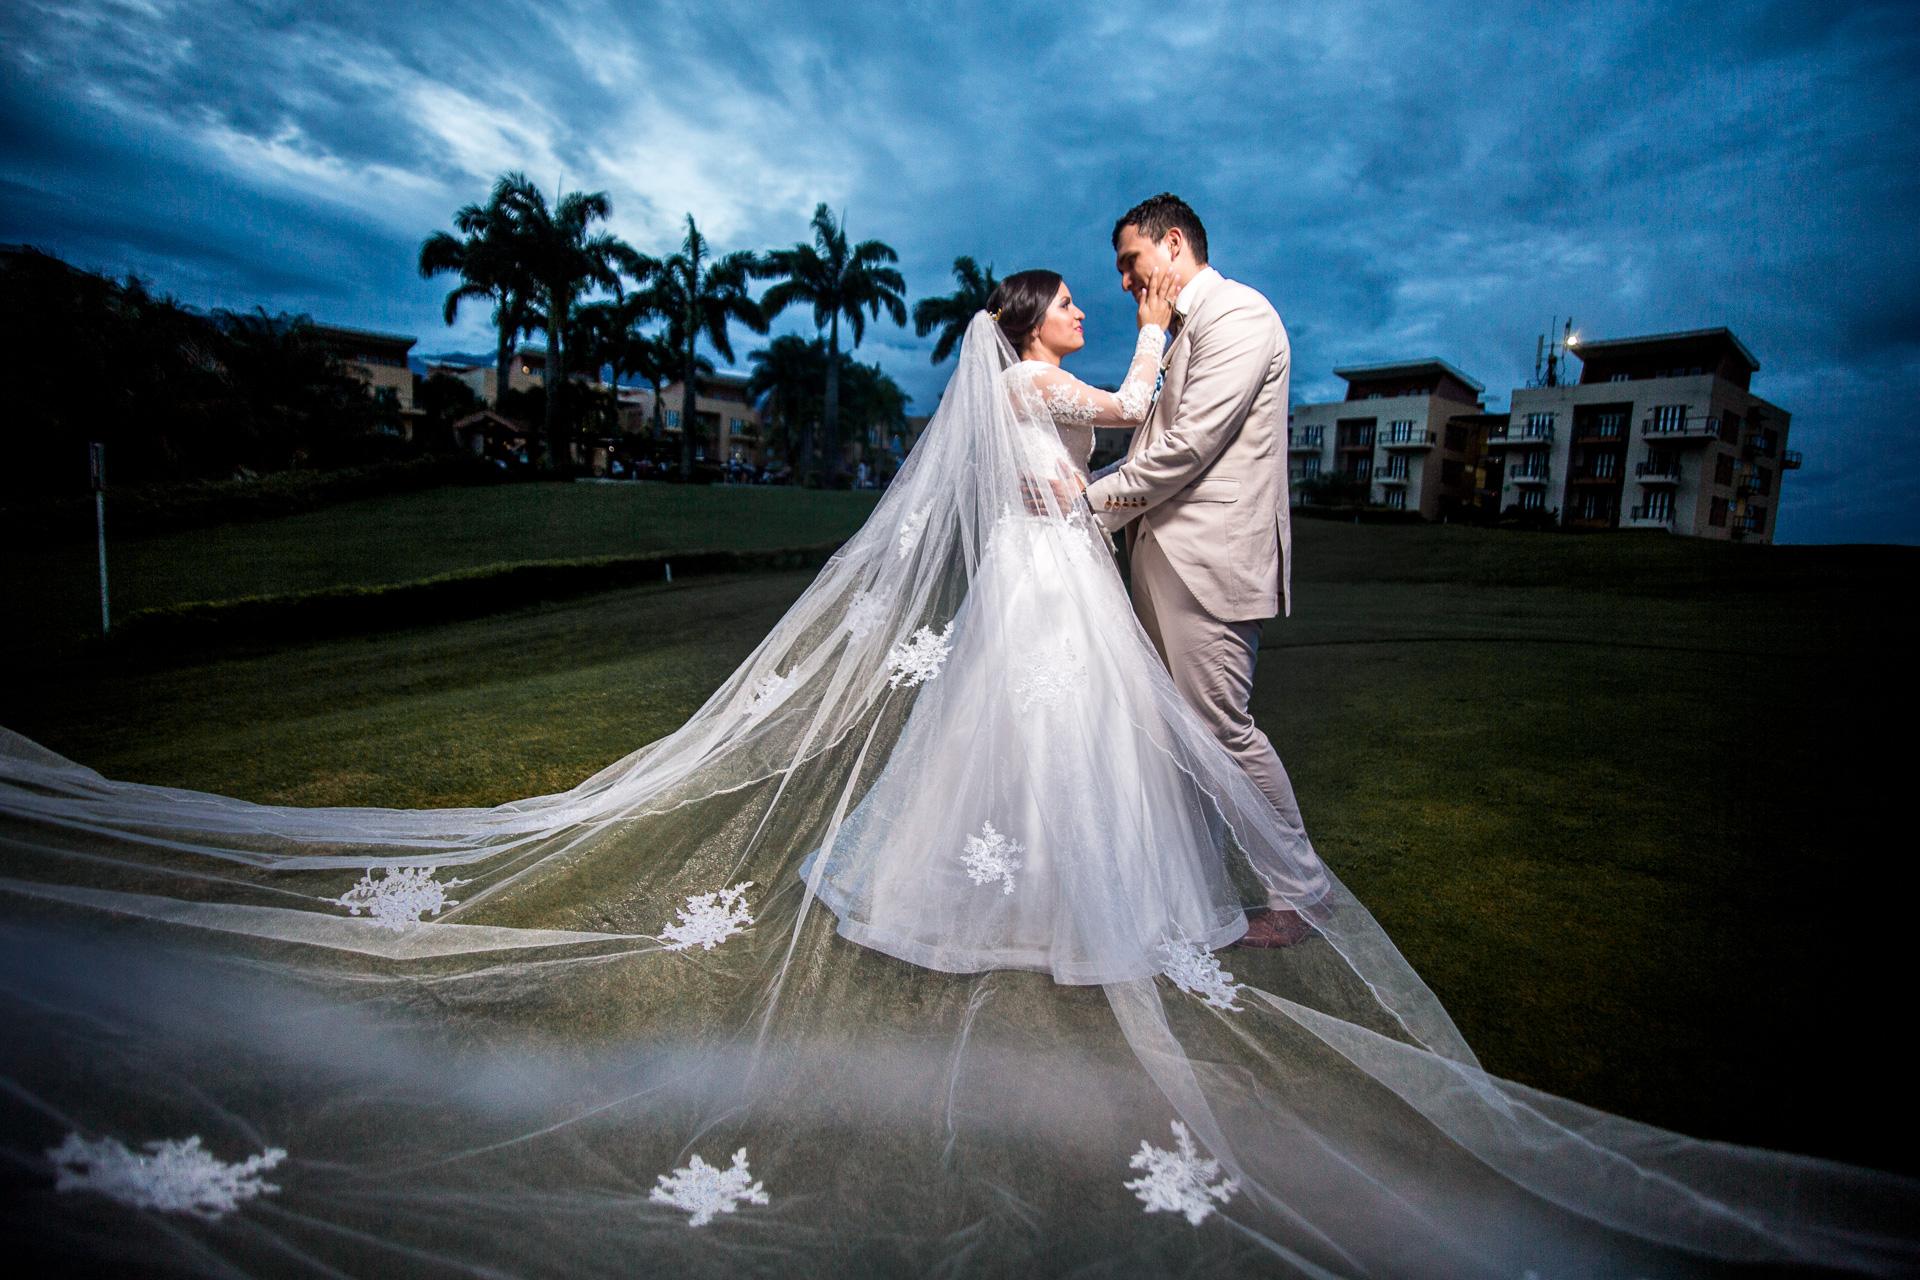 Fotógrafos-de-bodas-en-Colombia-Sthephanie-y-David-40 STEPHANIE + DAVID